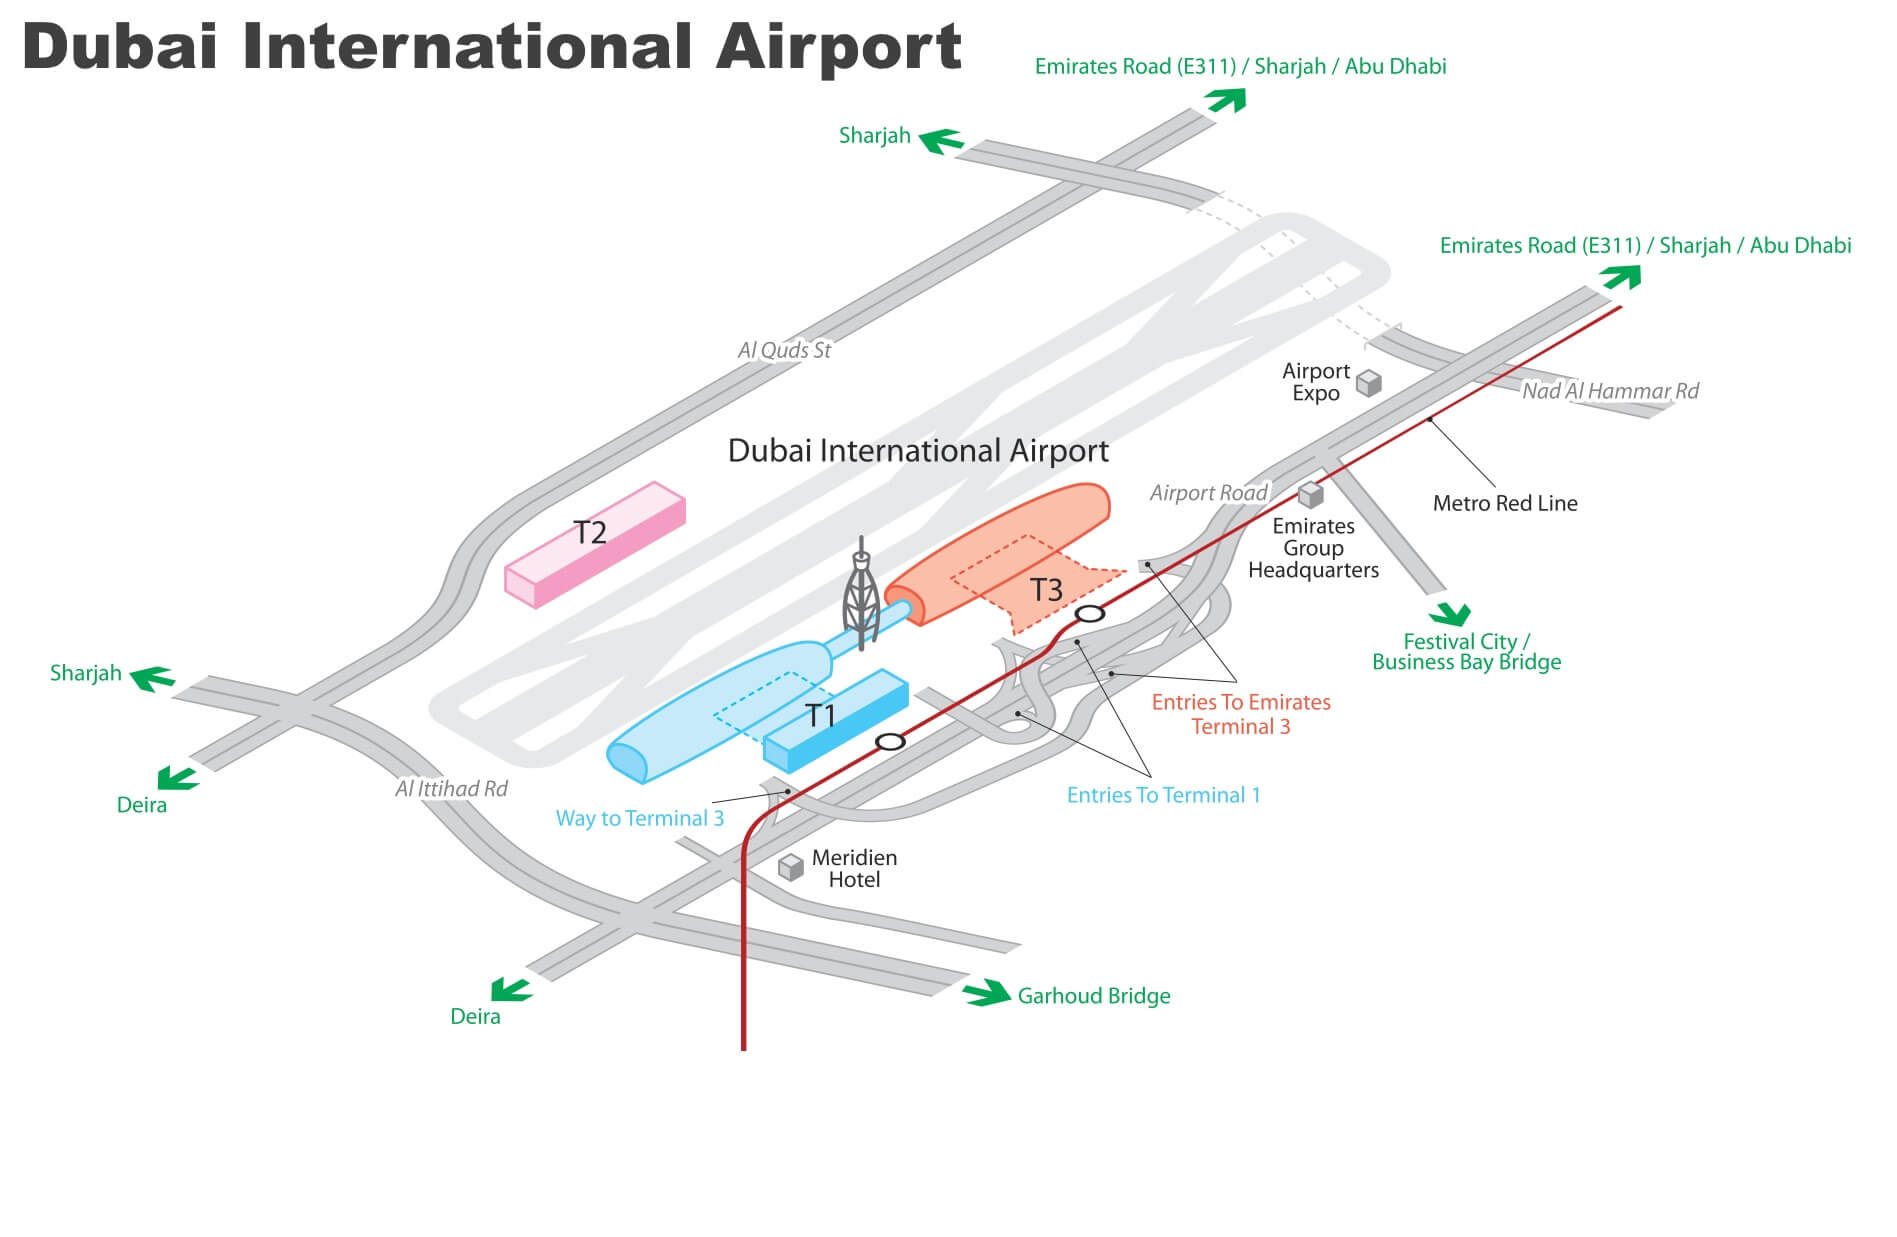 airport terminal 2 dubai location map Dubai Airport Terminal Dubai International Dxb Airport Terminal airport terminal 2 dubai location map